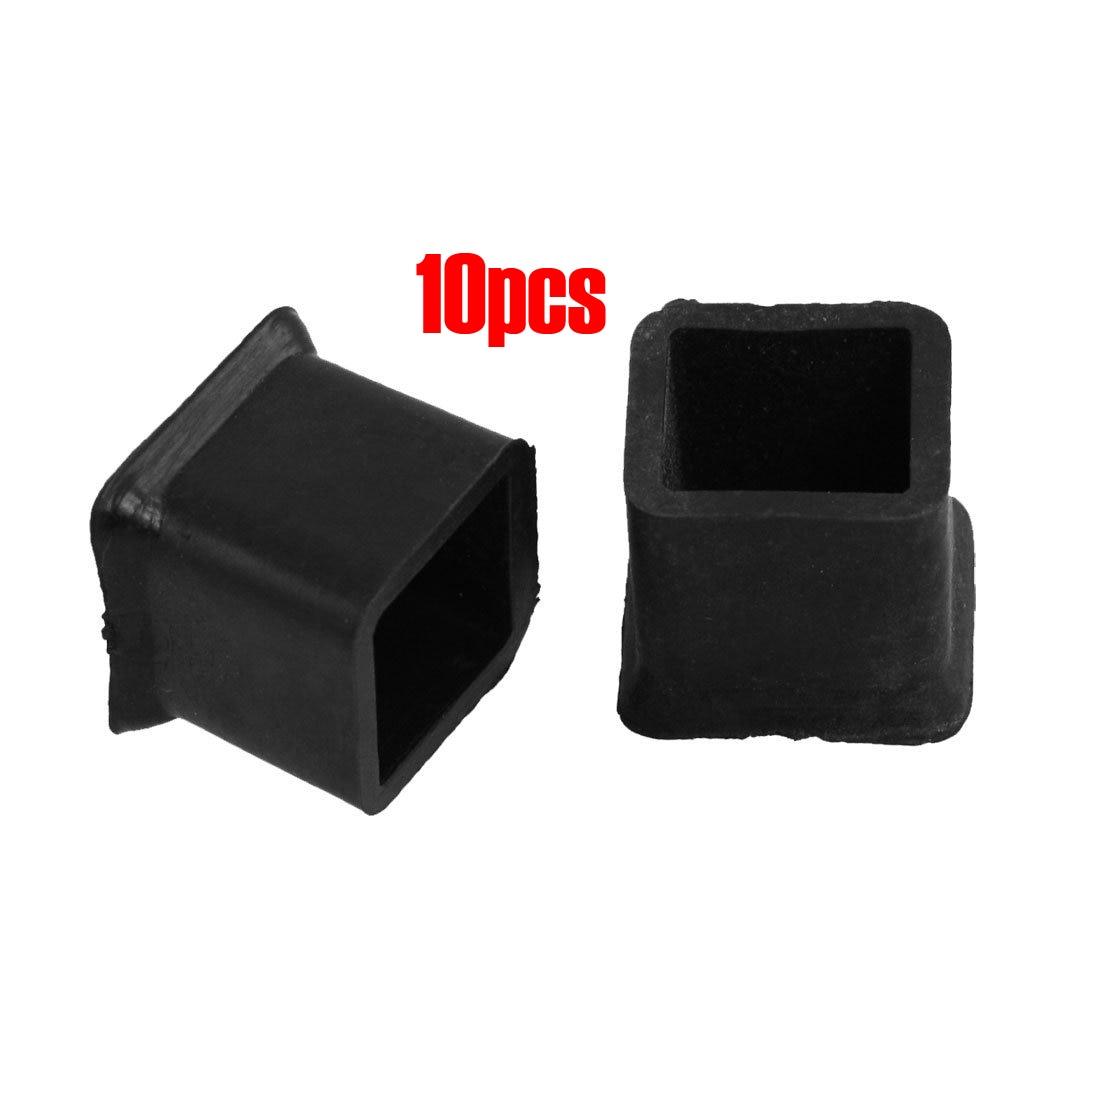 FJS!New 10Pcs Furniture Chair Table Leg Rubber Foot Covers Protectors 20mm x 20mm